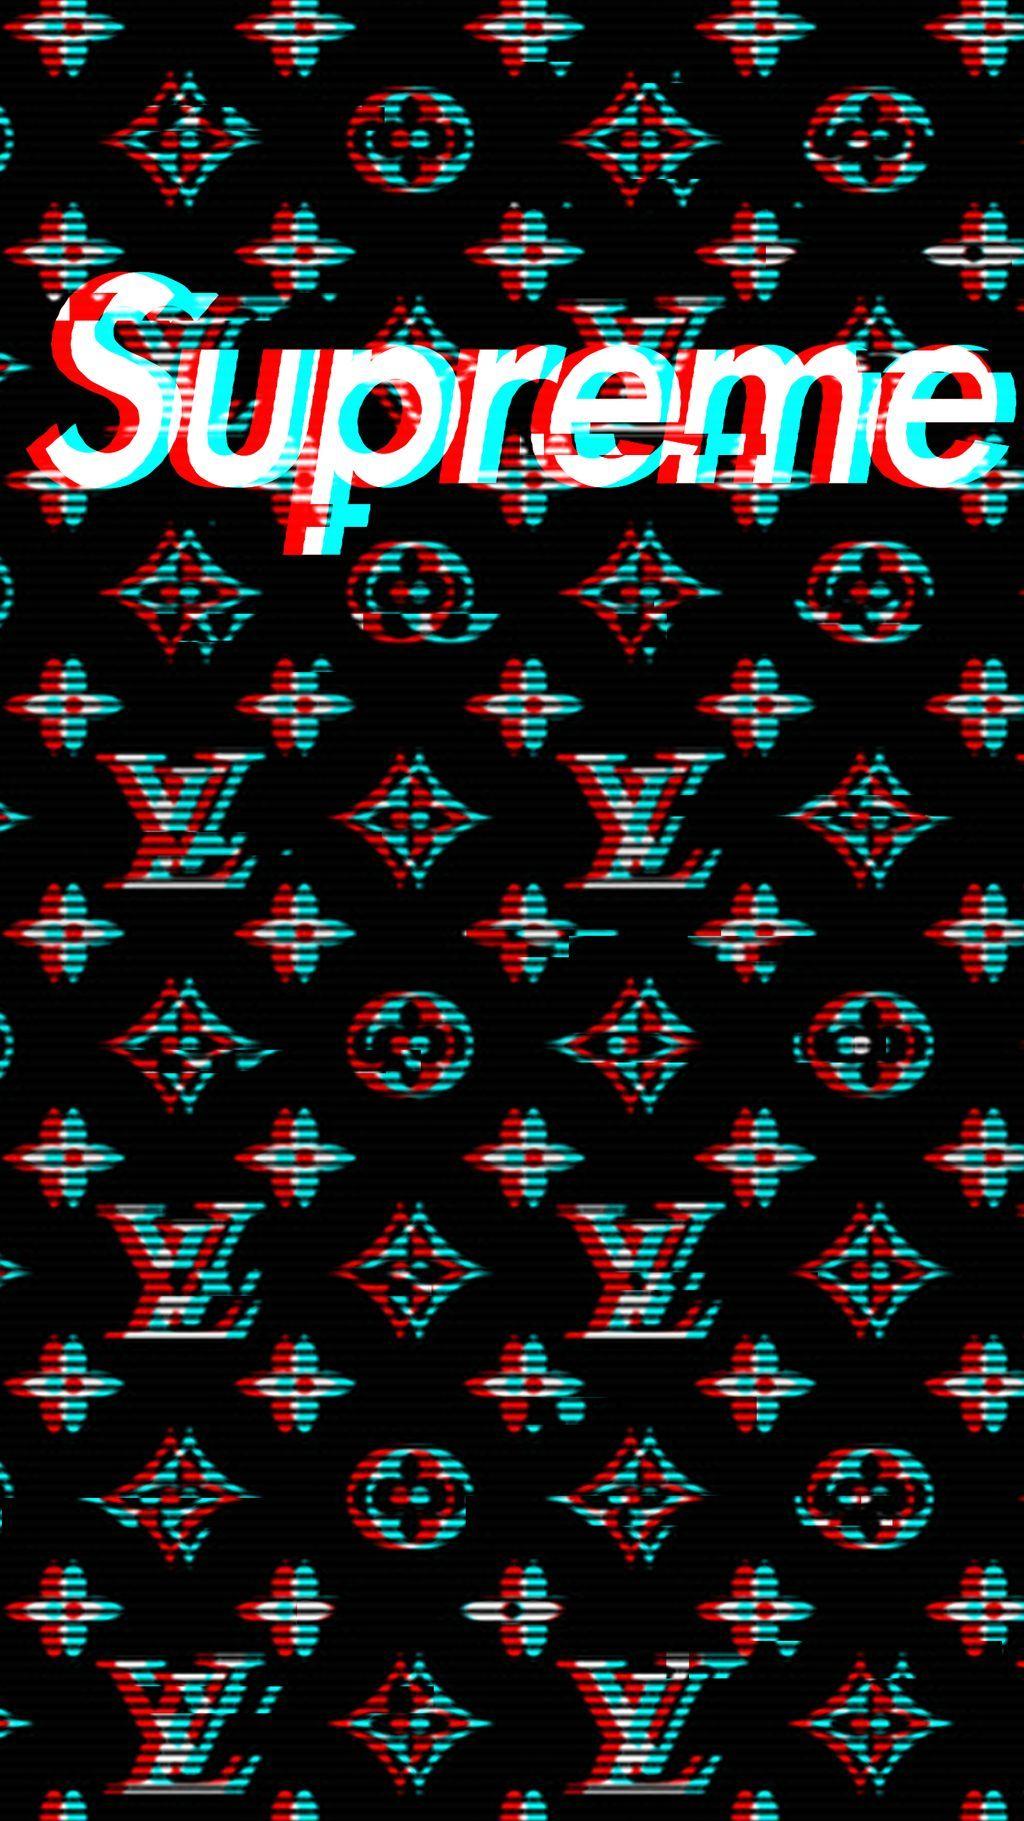 Louis Vuitton Supreme Mobile Wallpaper By Aron260 On Deviantart Supreme Iphone Wallpaper Supreme Wallpaper Louis Vuitton Iphone Wallpaper